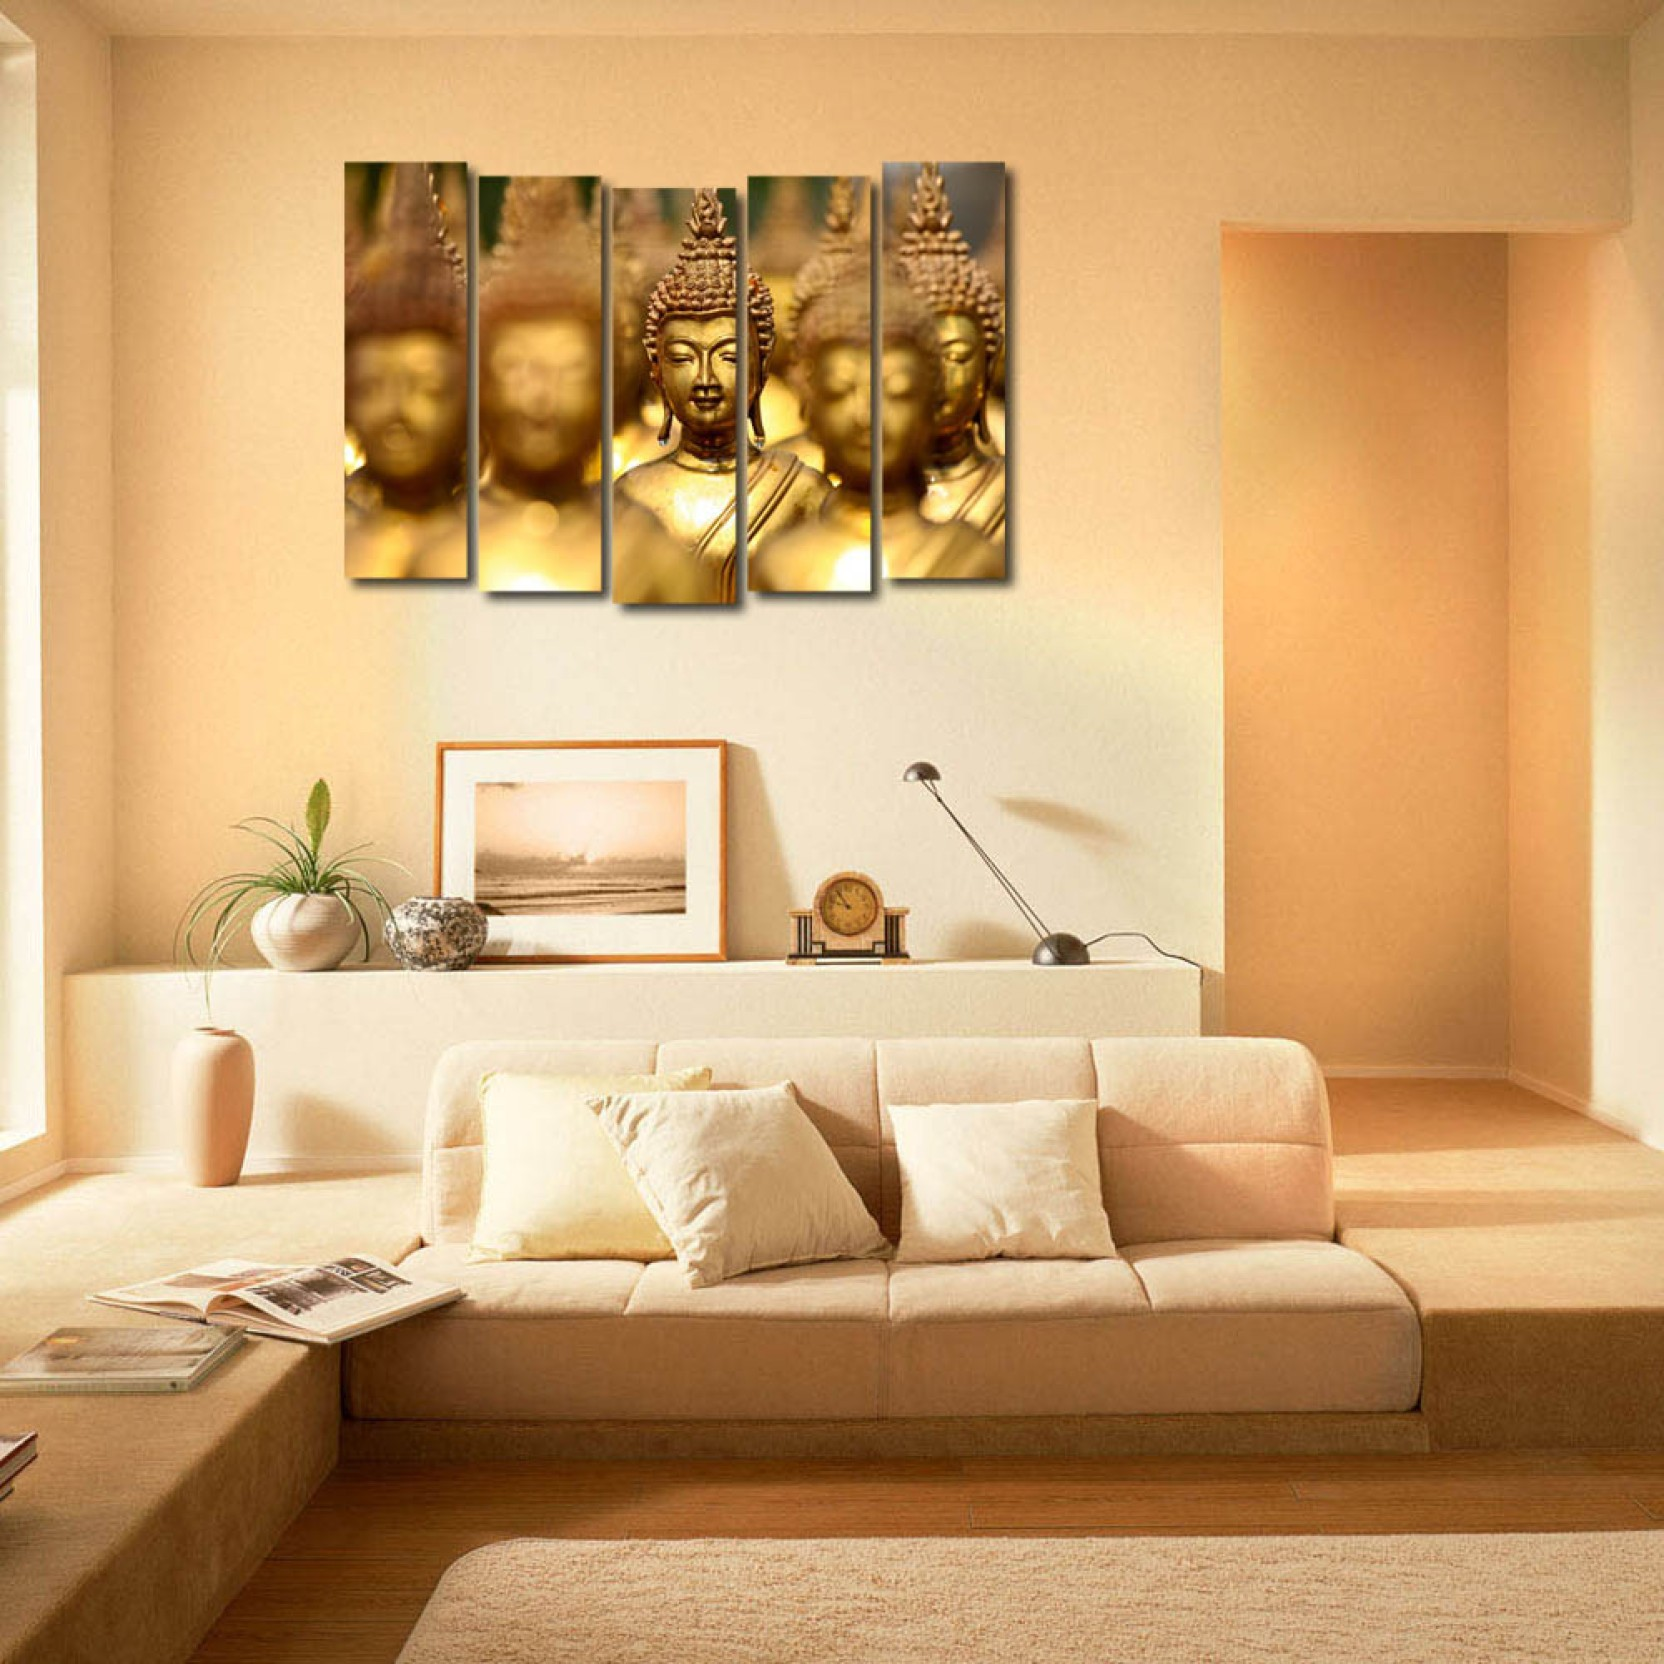 999 Store Multiple Frames Printed Buddha like Modern Wall Art ...